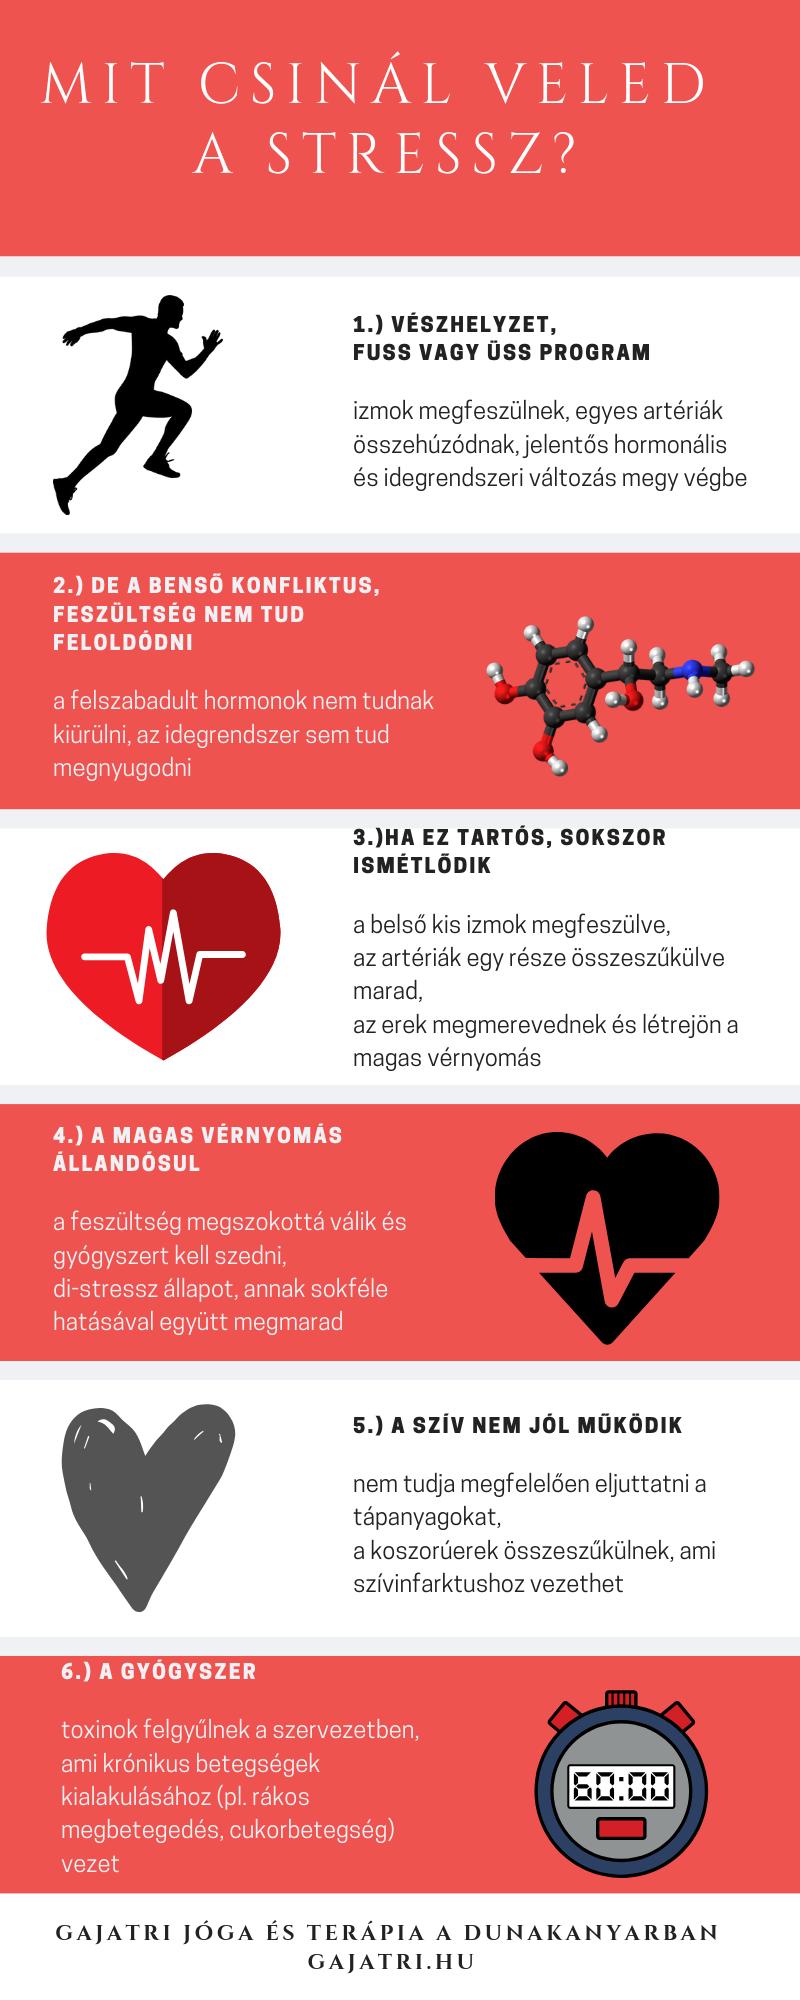 adonis magas vérnyomás esetén nedvek keveréke magas vérnyomás esetén